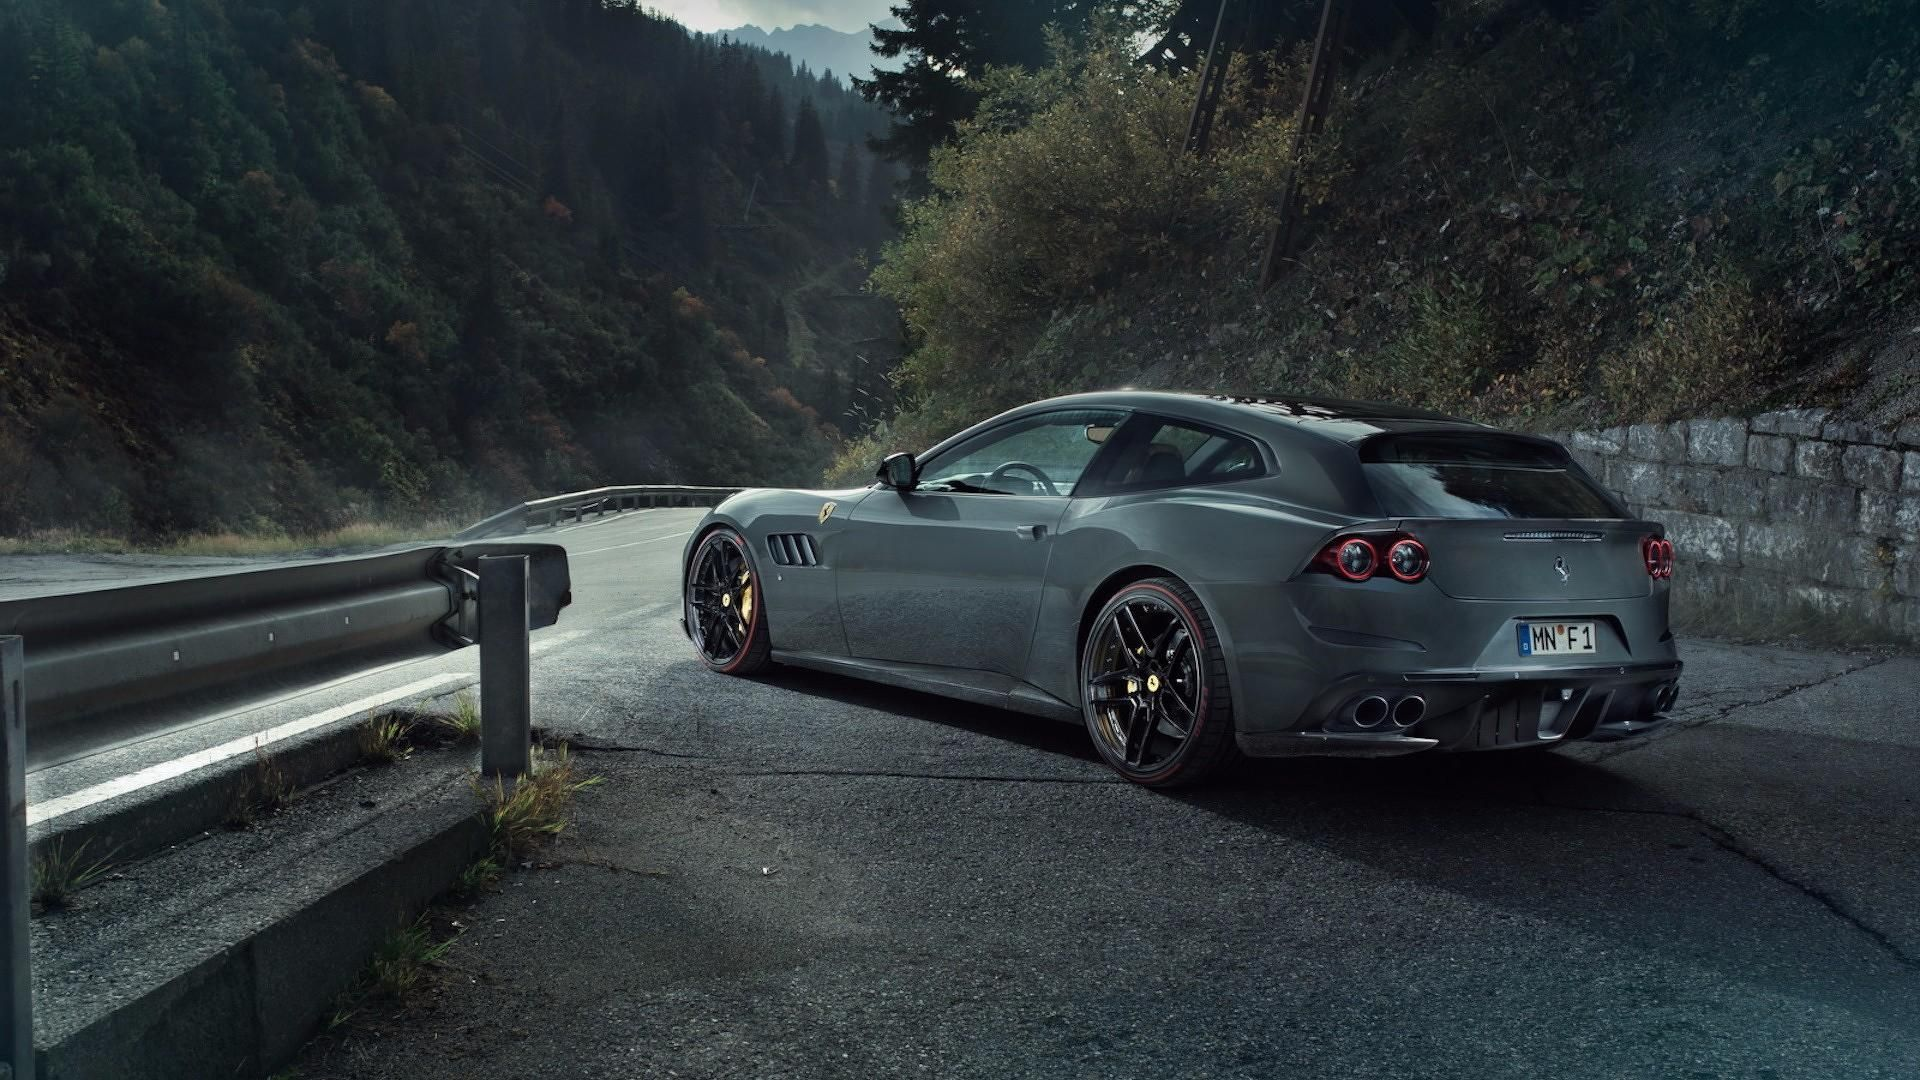 Ferrari Gtc4lusso T Wallpaper Full Hd P2m Cars Desktop Hd